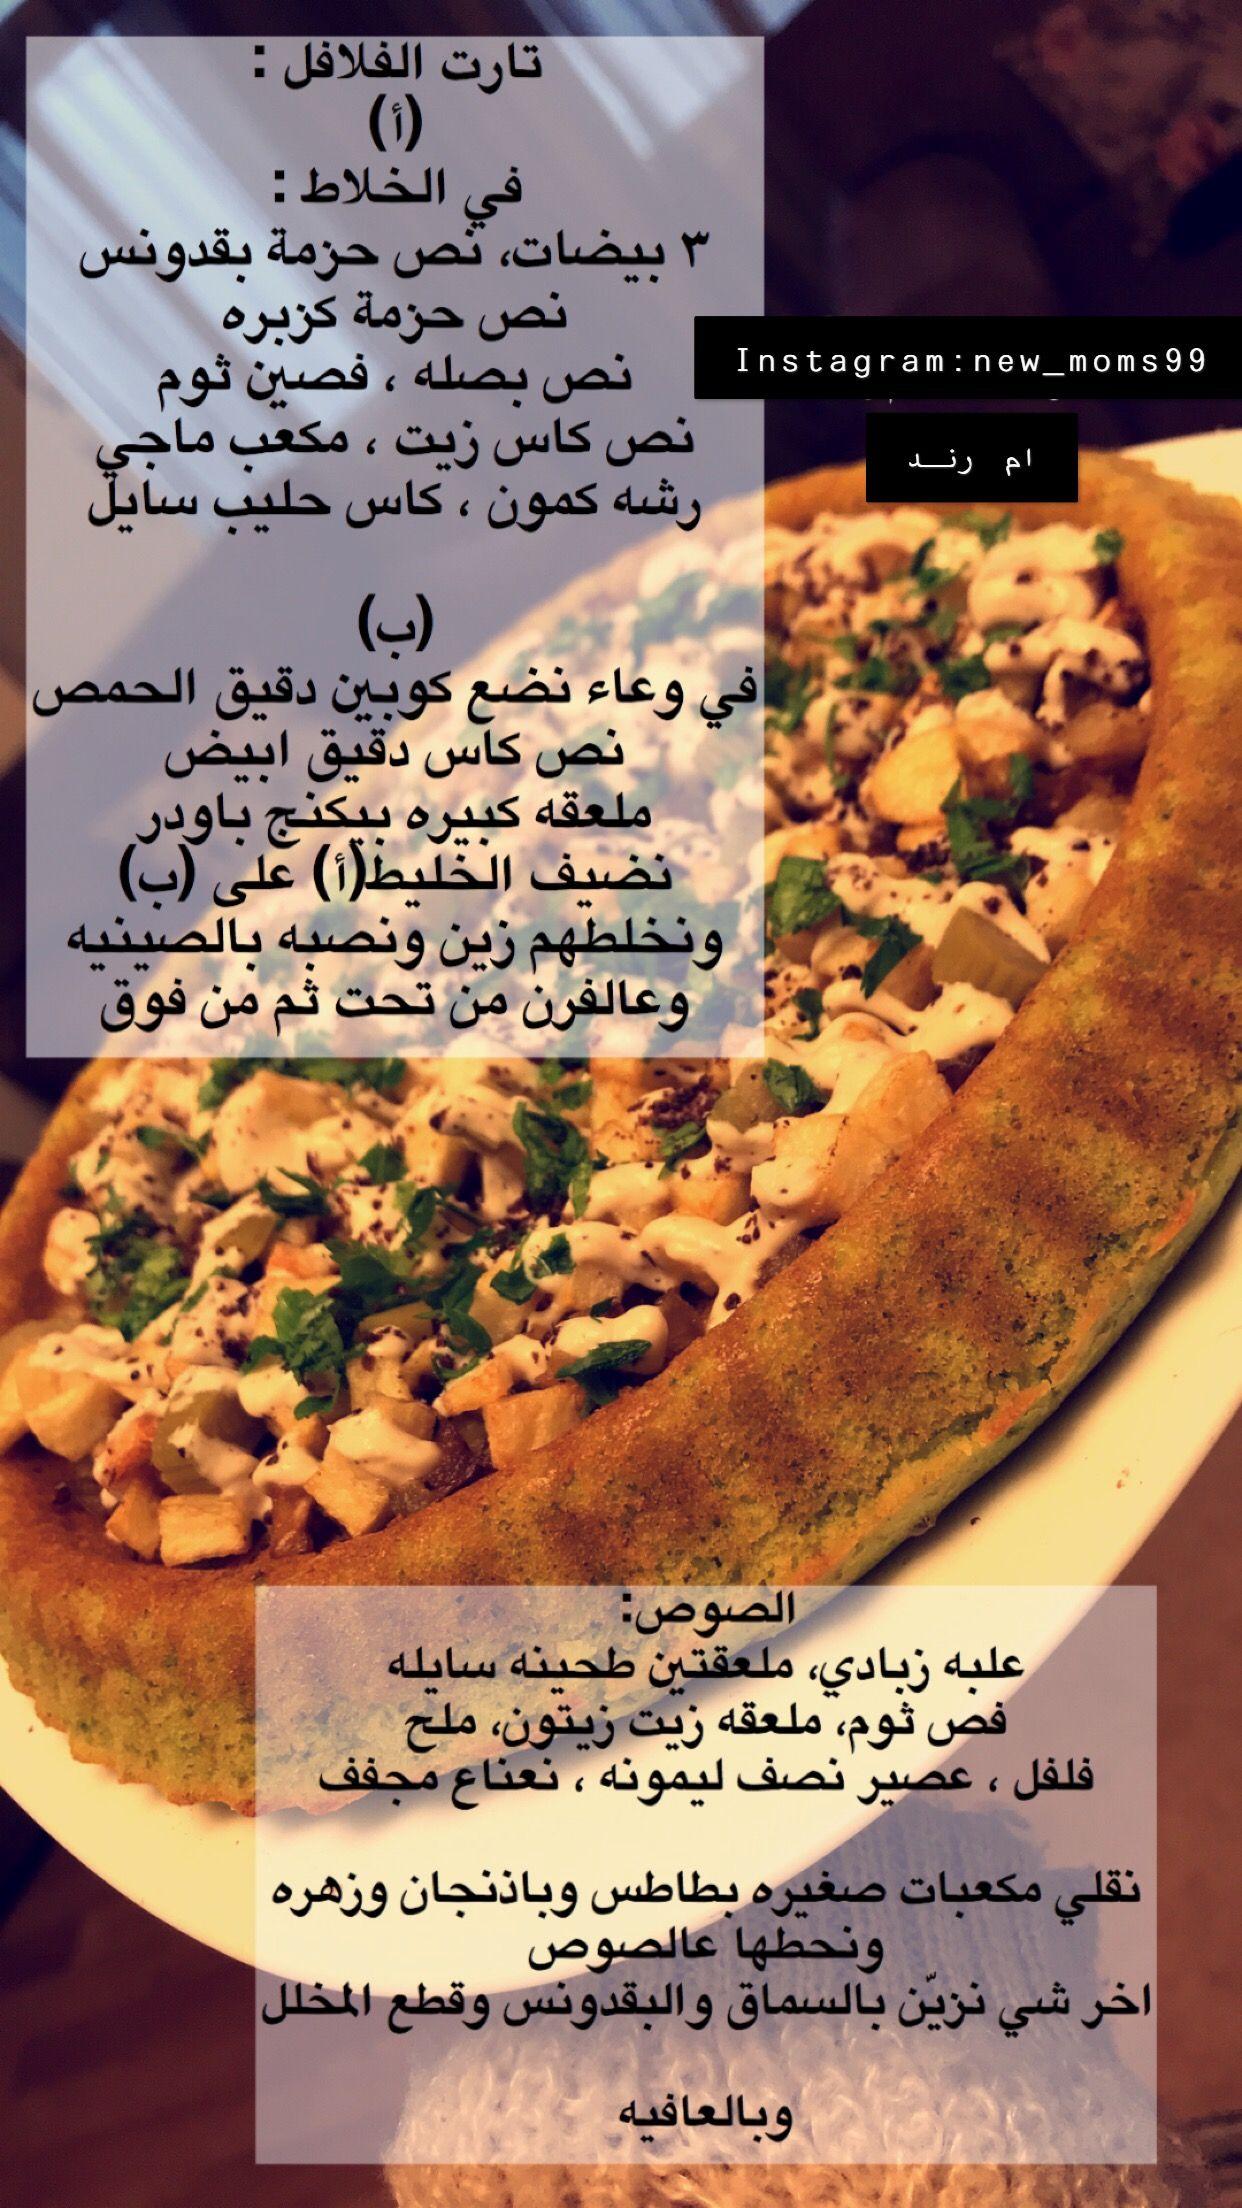 تارت الفلافل Snap Food Healty Food Dessert Ingredients